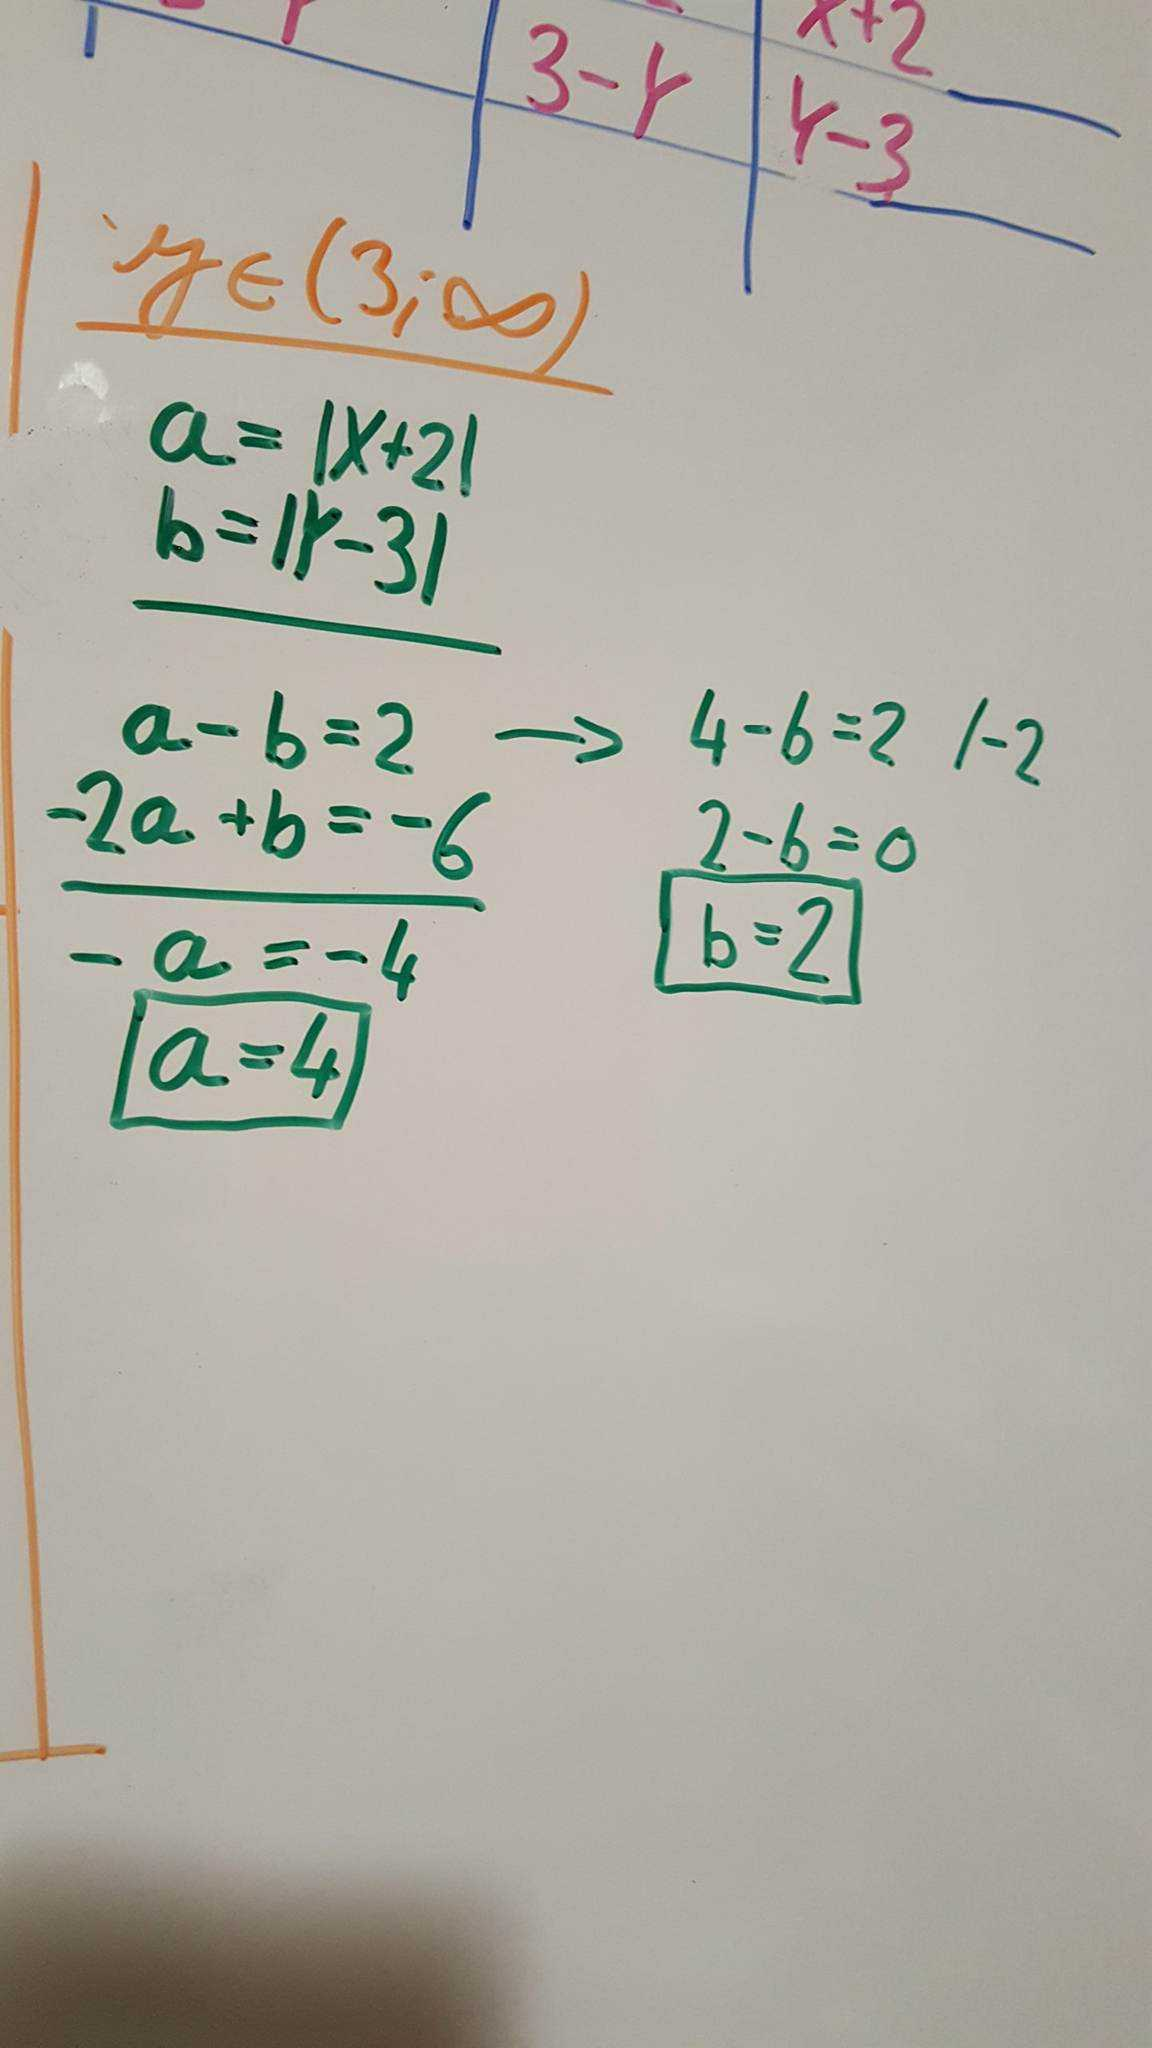 http://forum.matematika.cz/upload3/img/2018-02/63779_tabule2.jpg